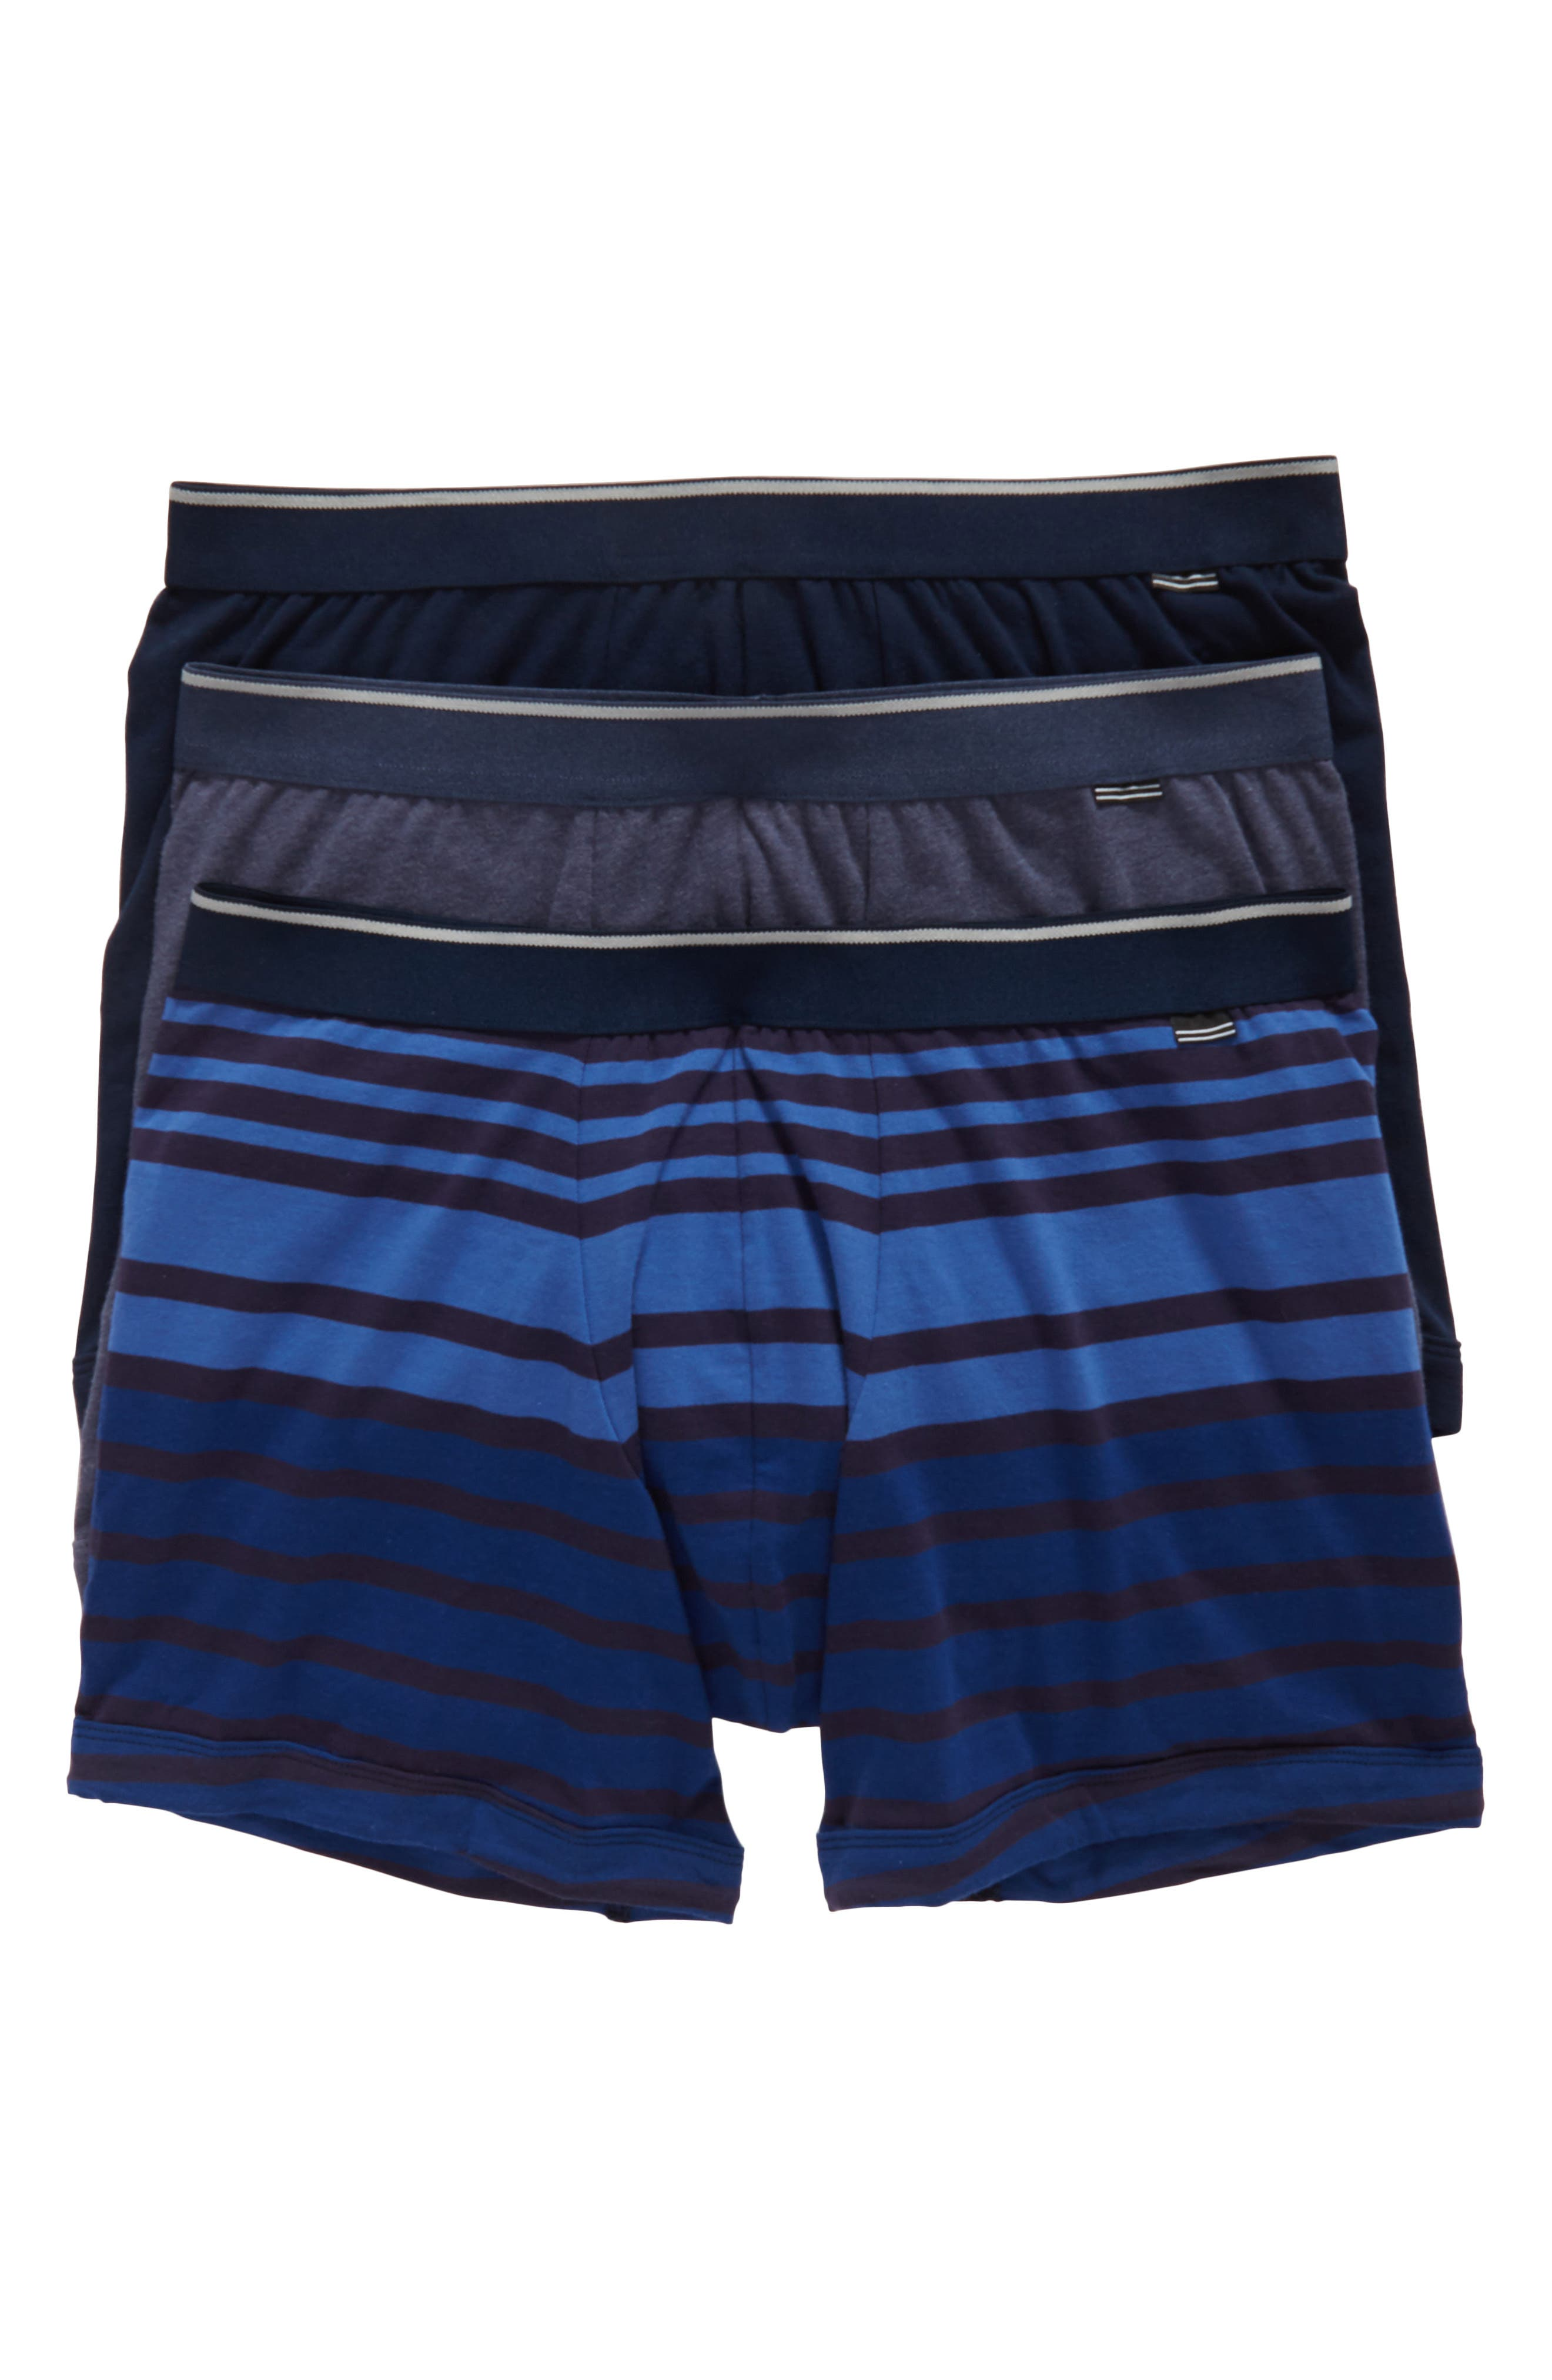 3-Pack Boxer Briefs,                             Main thumbnail 1, color,                             Navy/ Navy-Blue Stripe